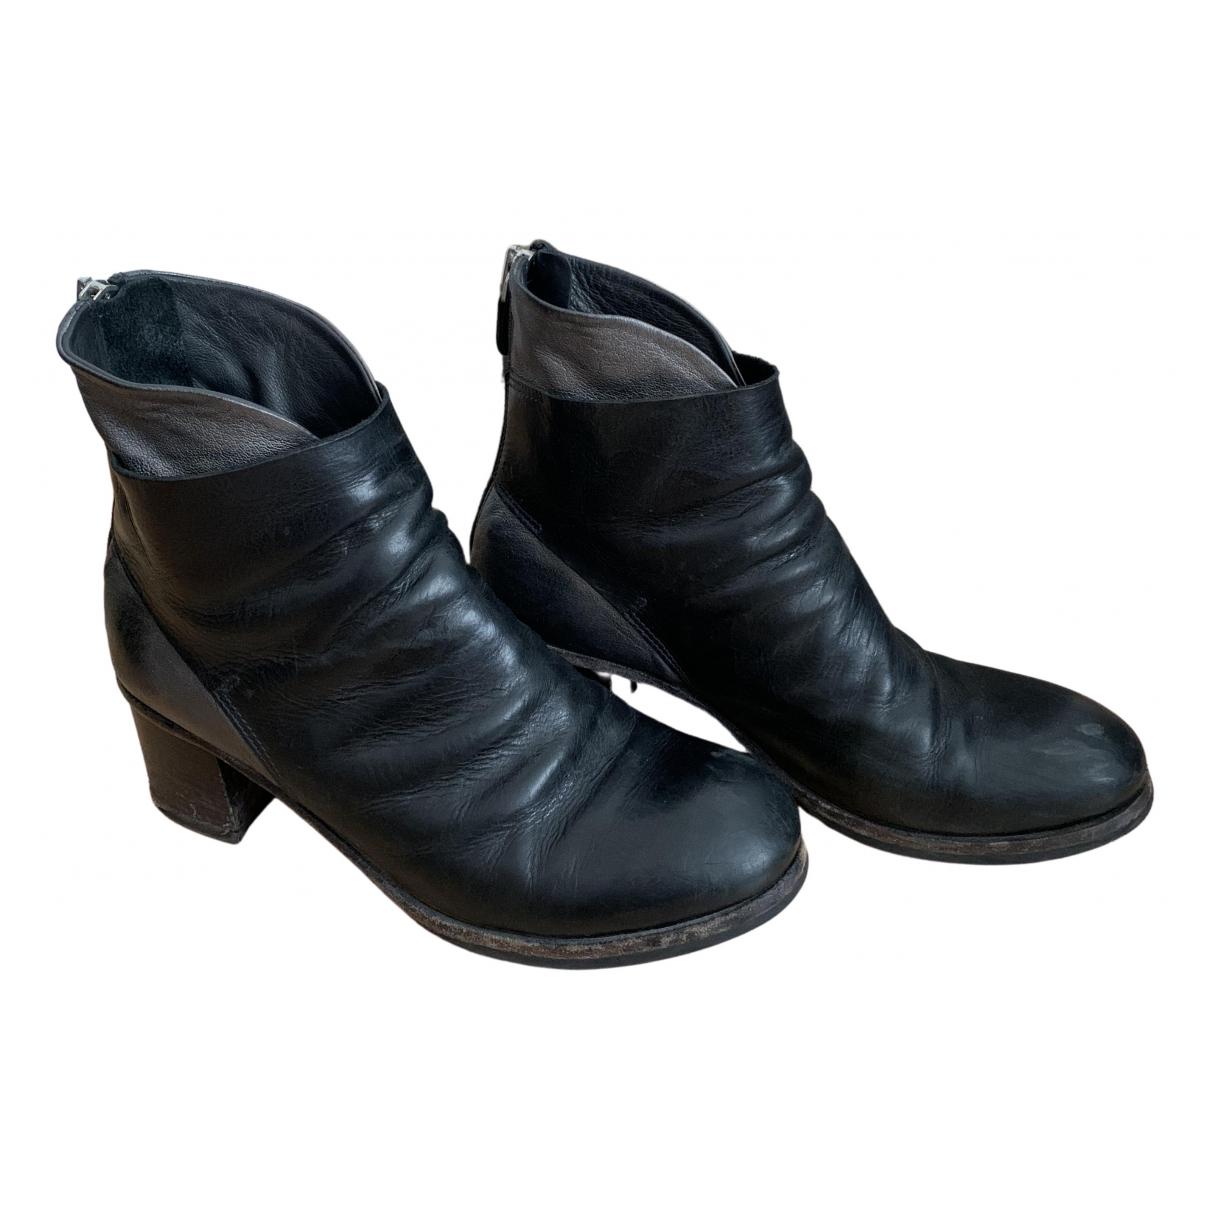 Moma \N Stiefeletten in  Schwarz Leder